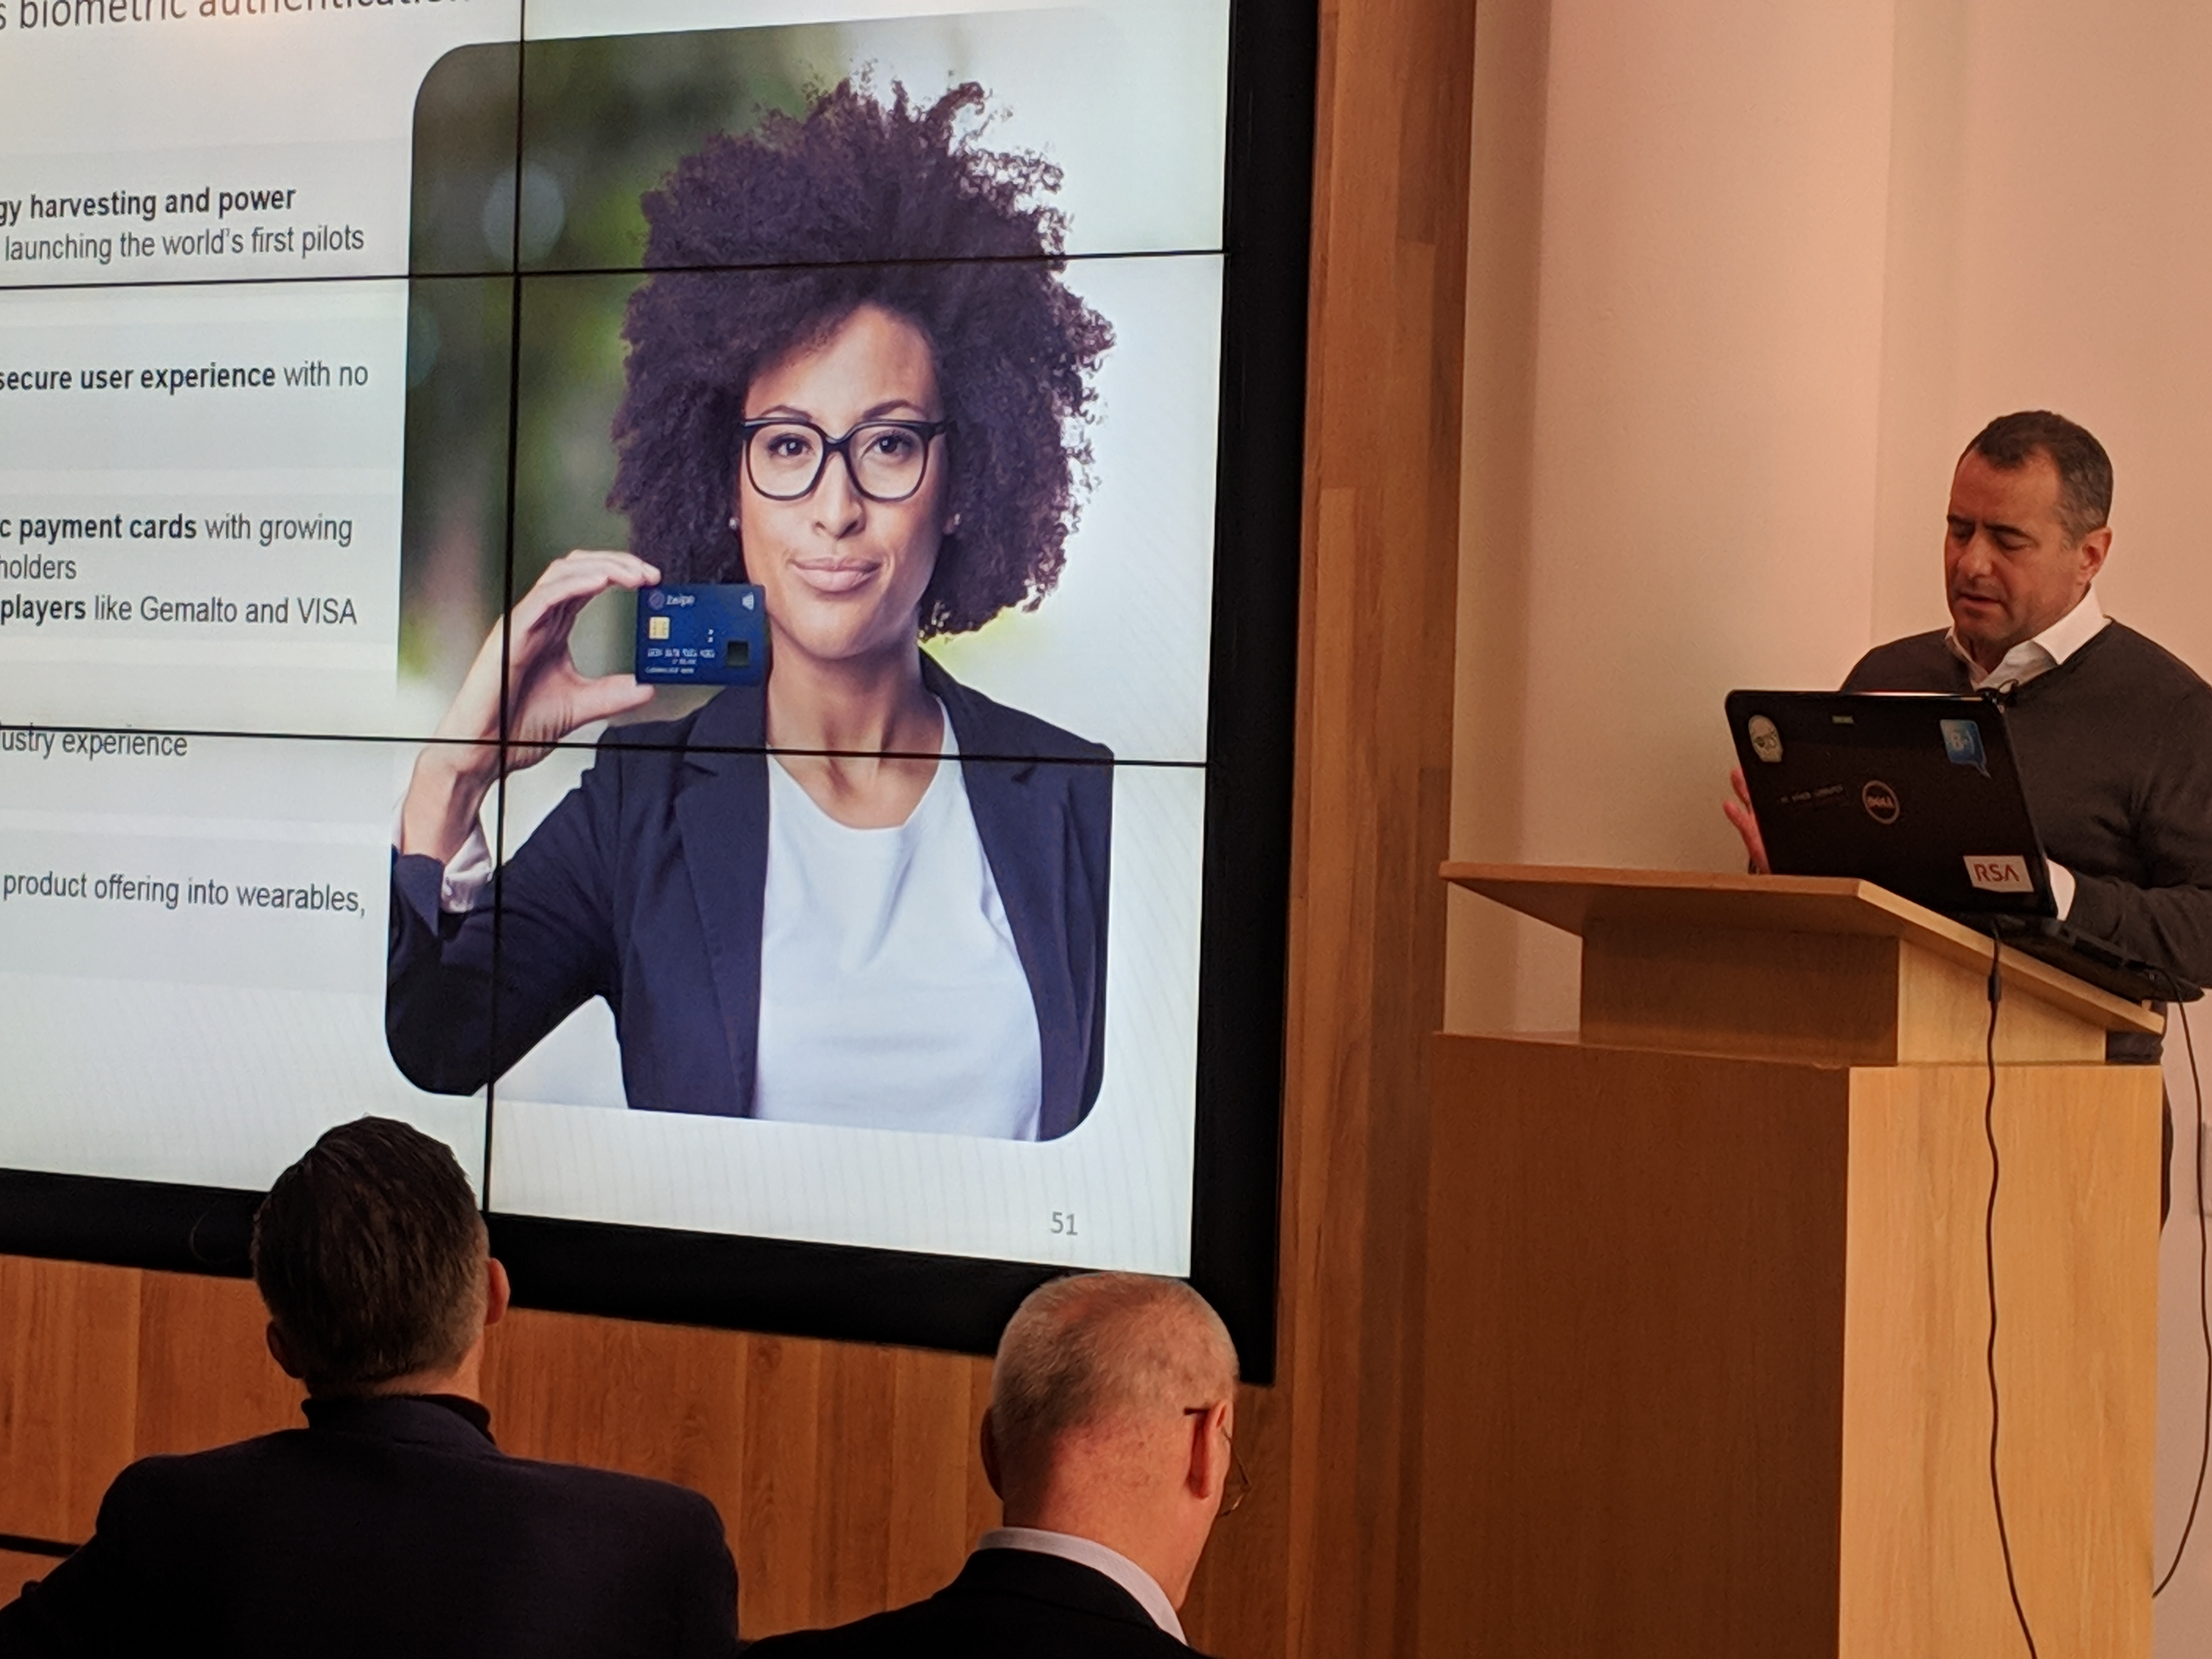 Andre_Zwipe_Biometric Summit NYC 2019